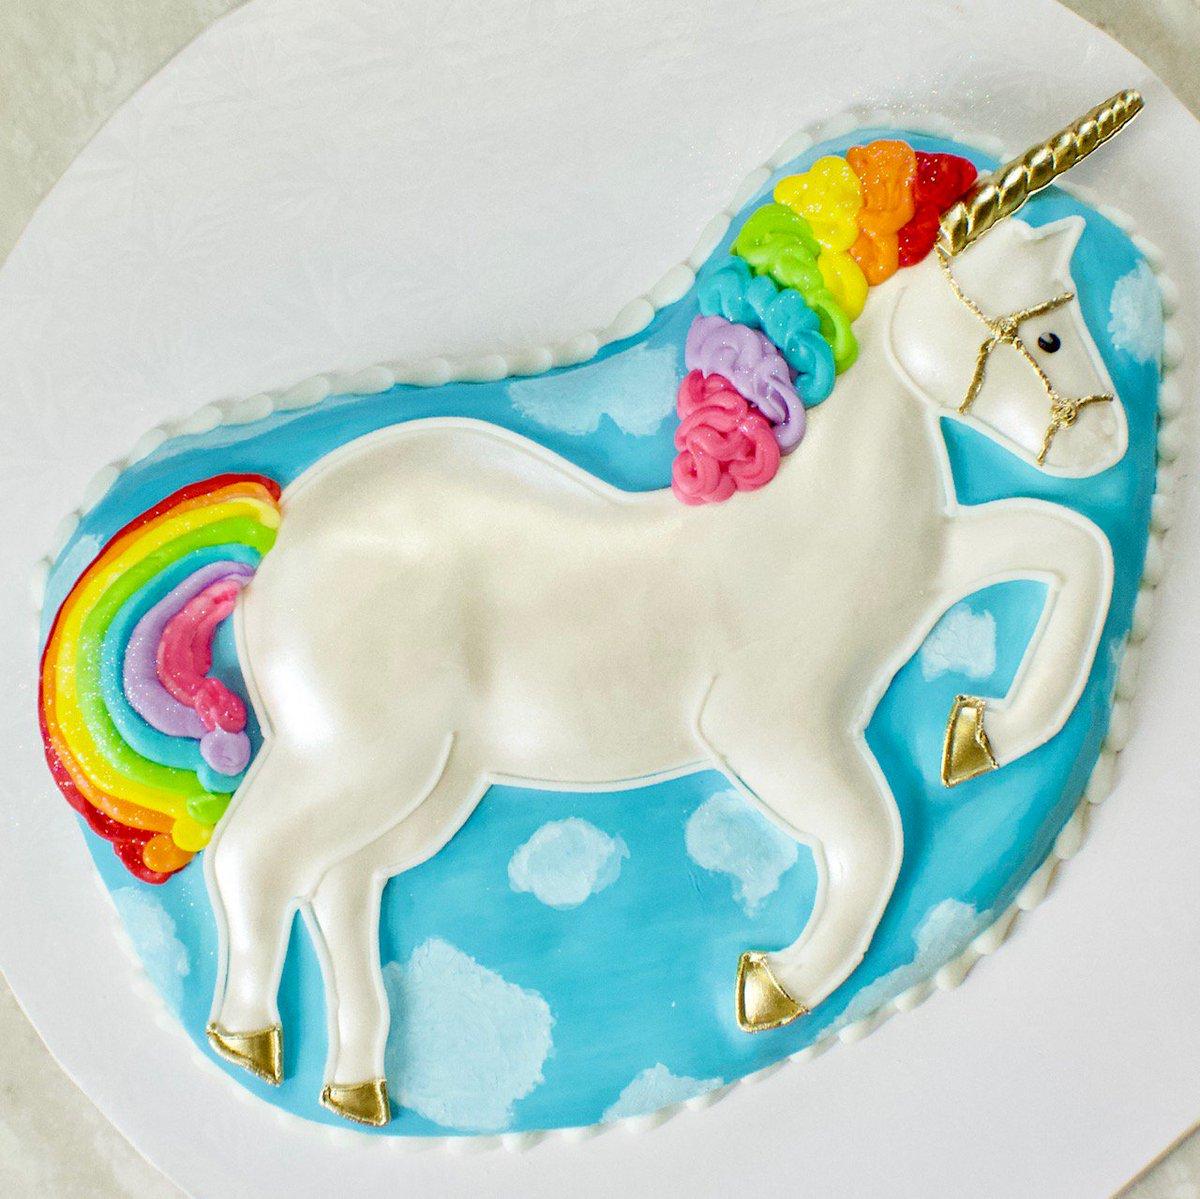 CK Products Horse//Unicorn Pantastic Plastic Cake Pan